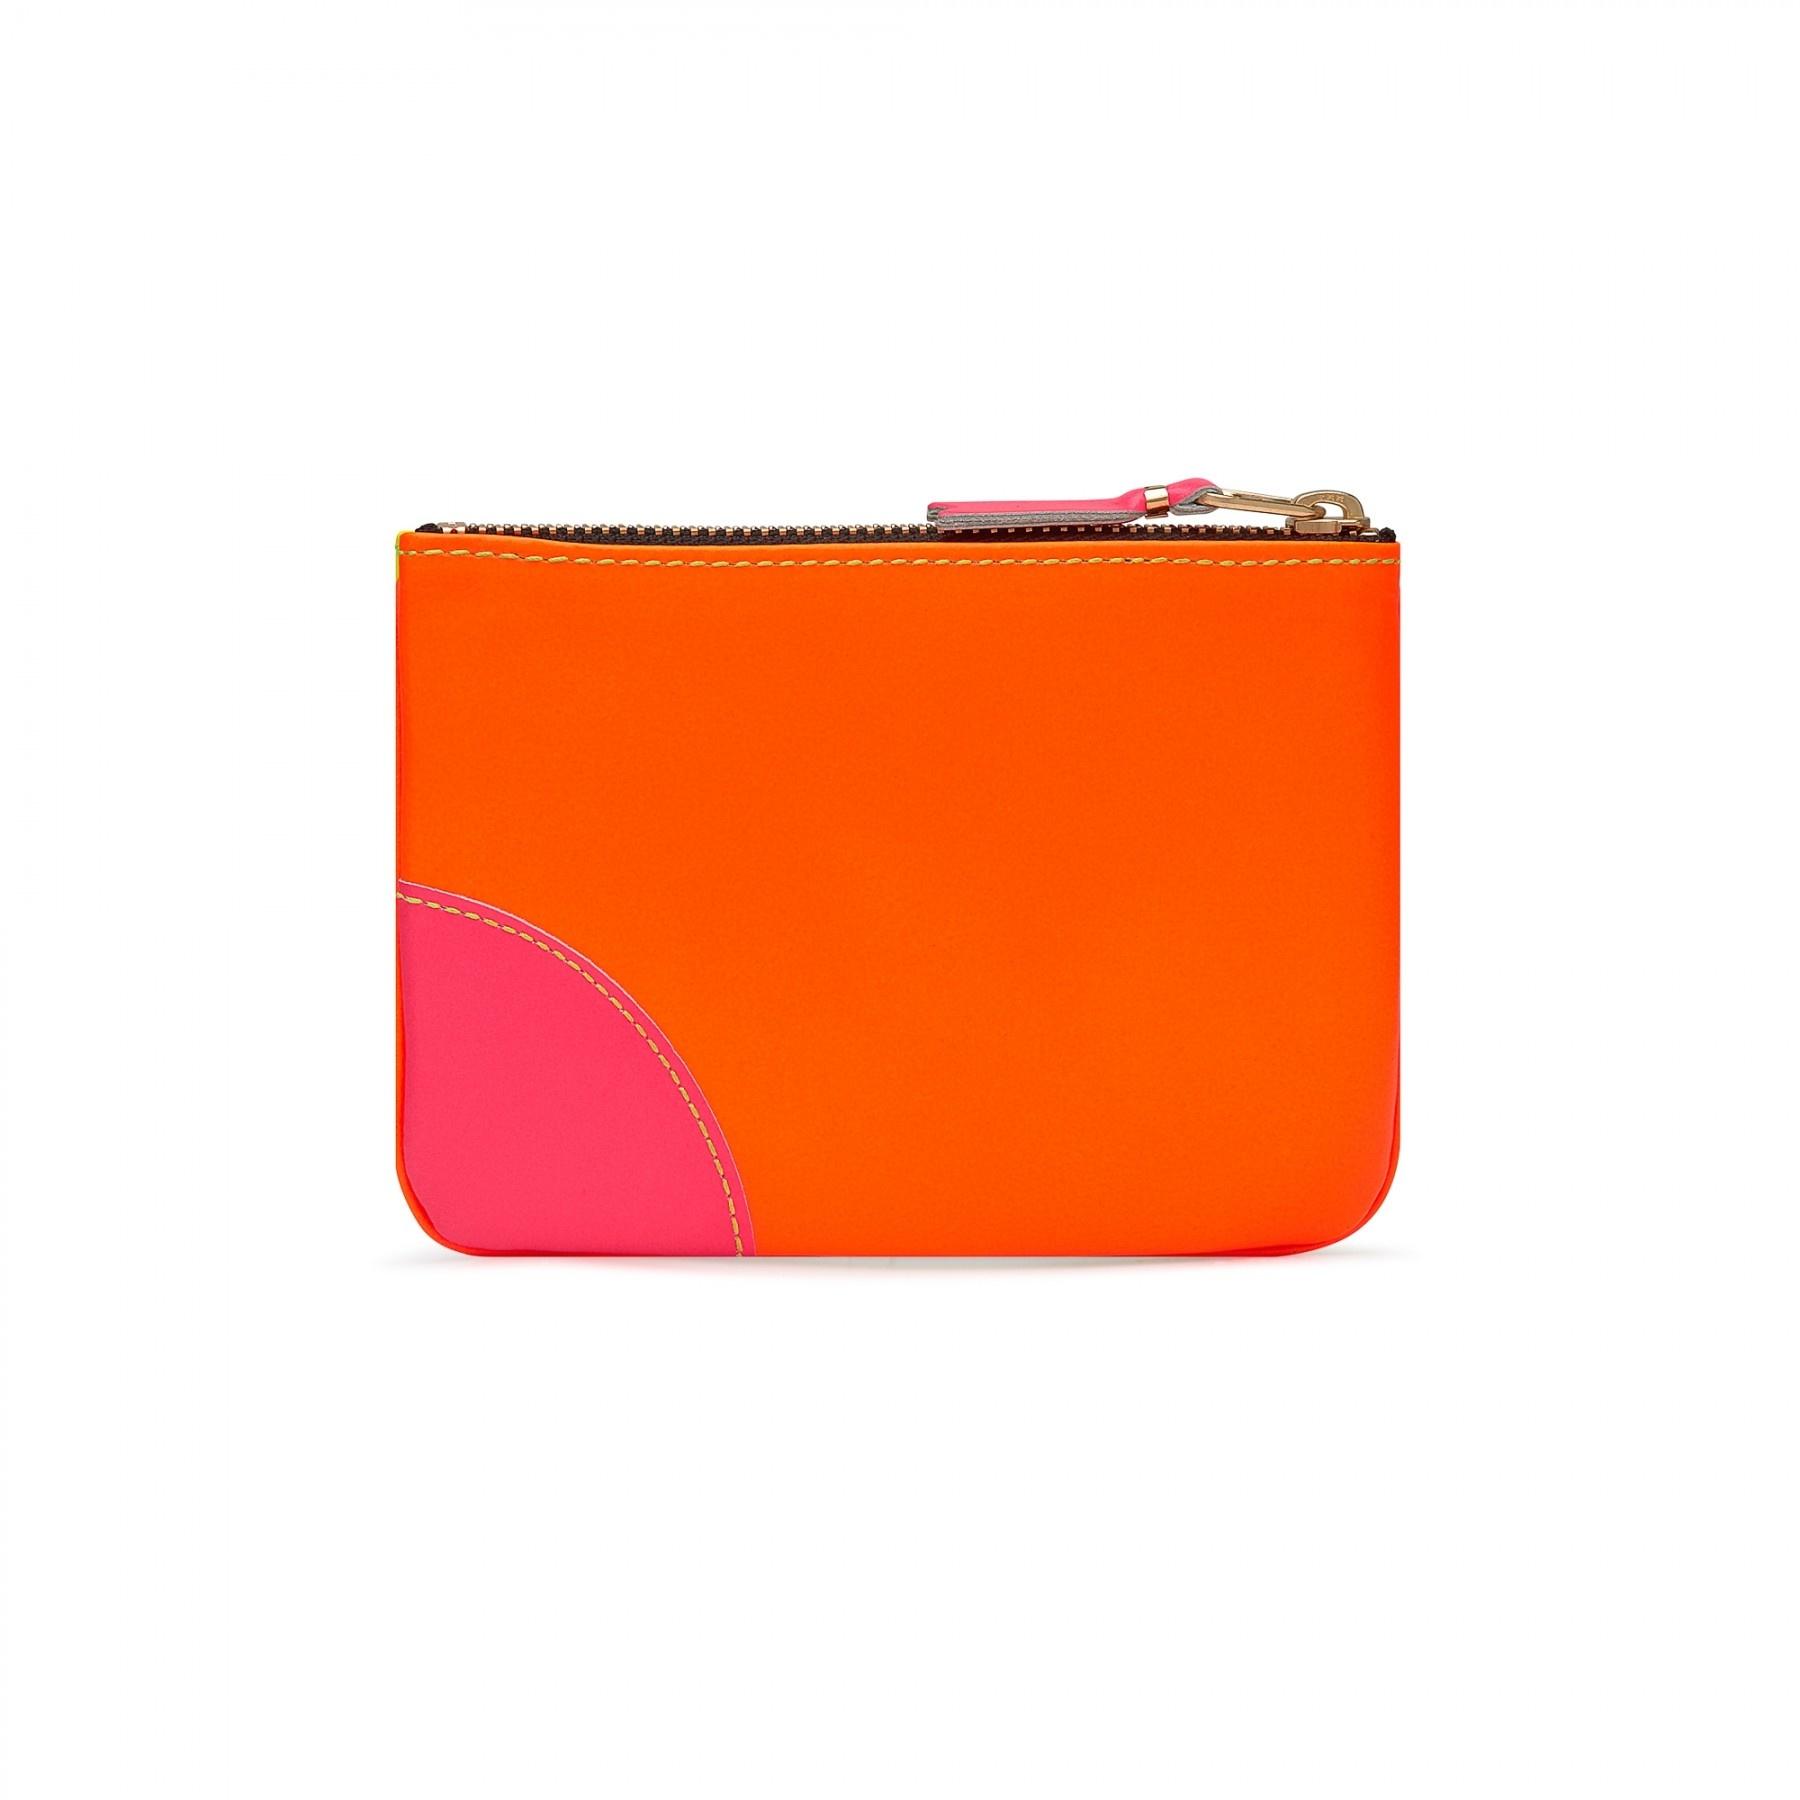 COMME des GARÇONS Wallet Small Zip Pouch Super Fluo Yellow/OrangeSA8100SF